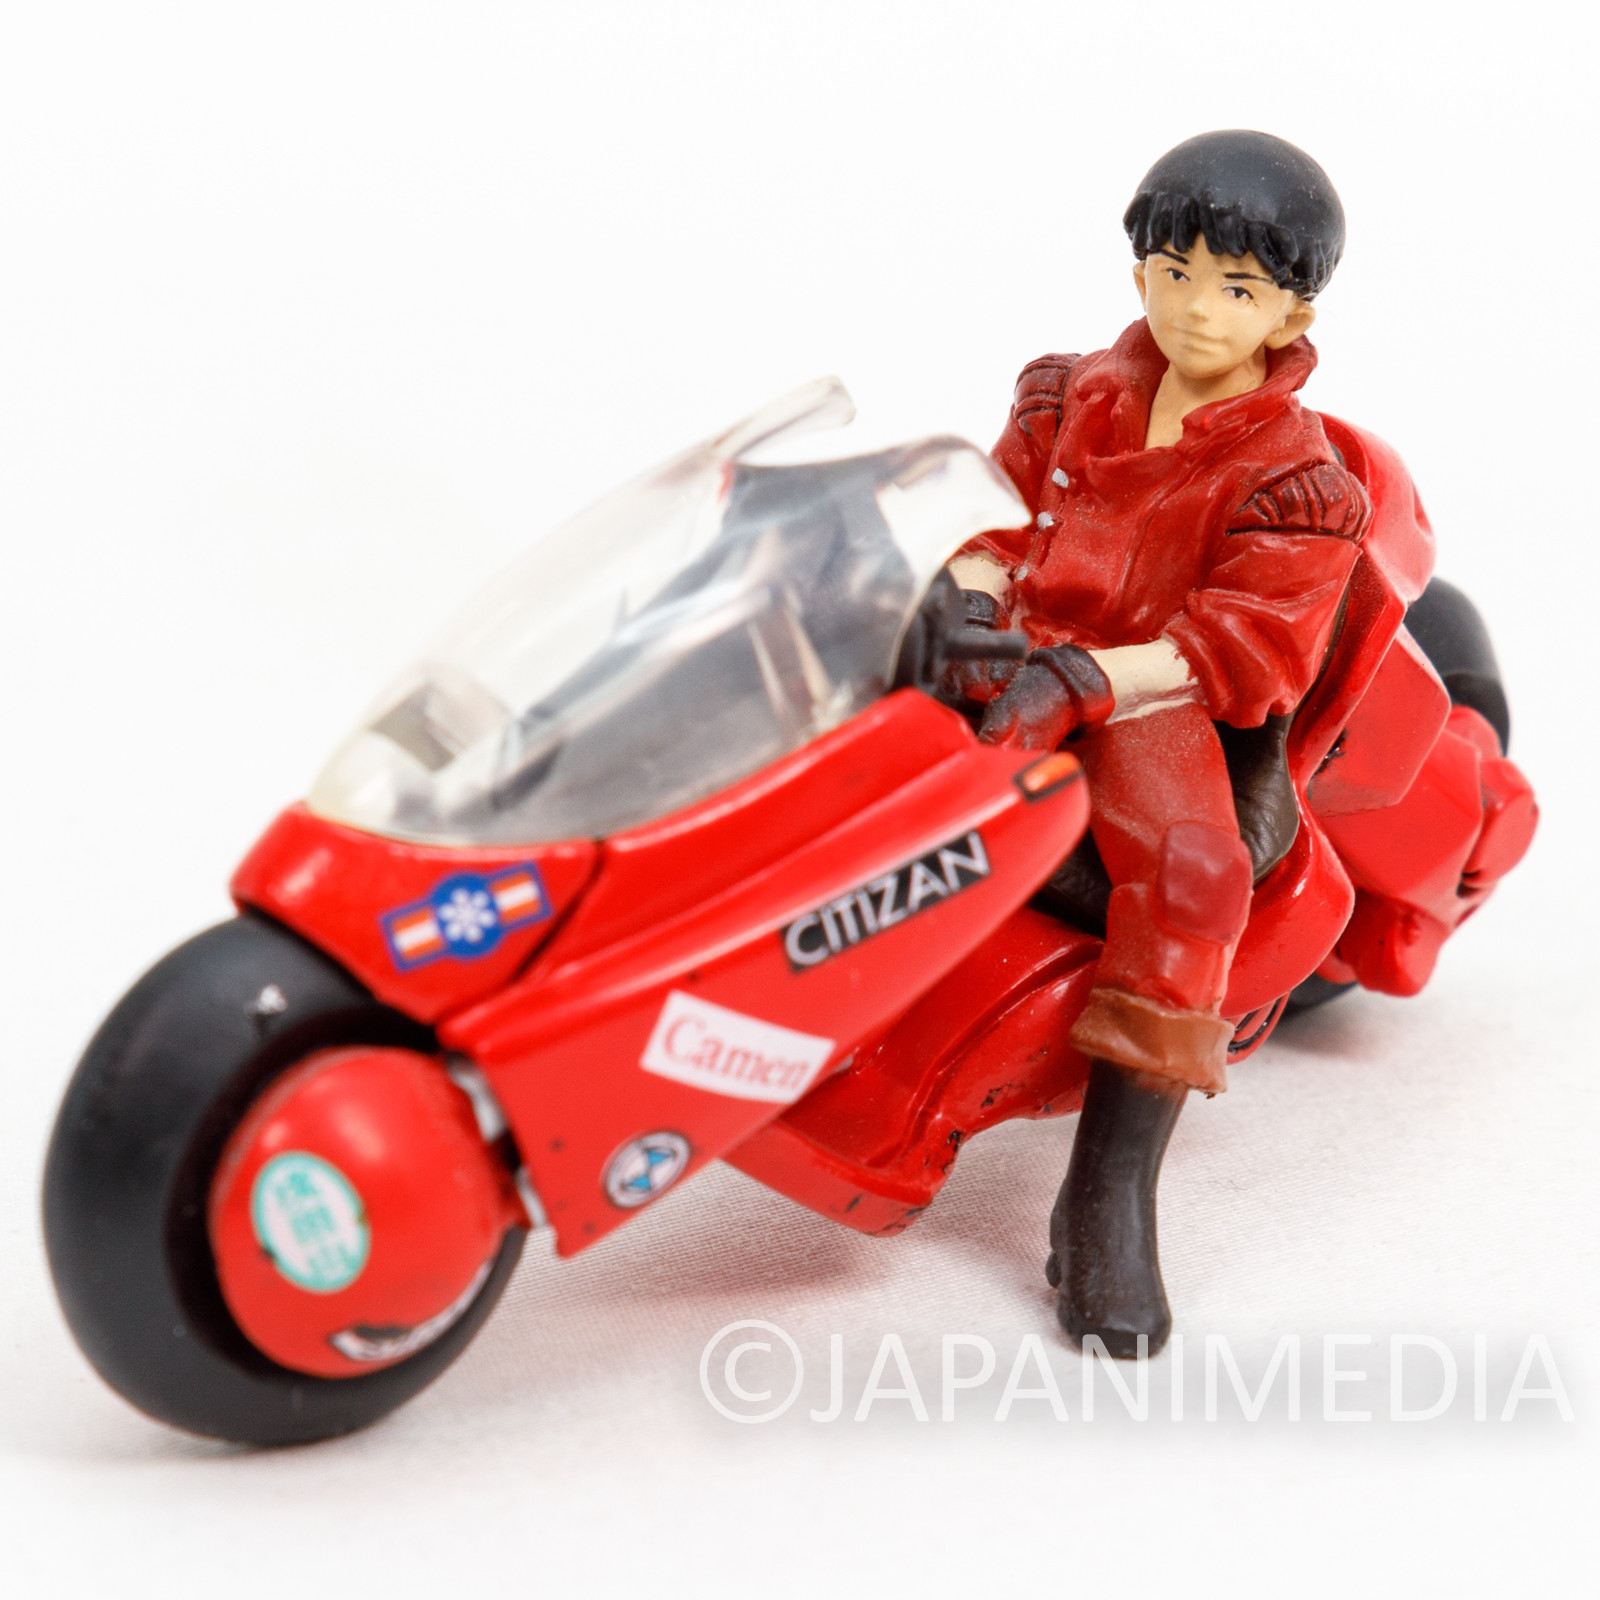 AKIRA Kaneda's Bike Miniature Figure Otomo Katsuhiro JAPAN ANIME